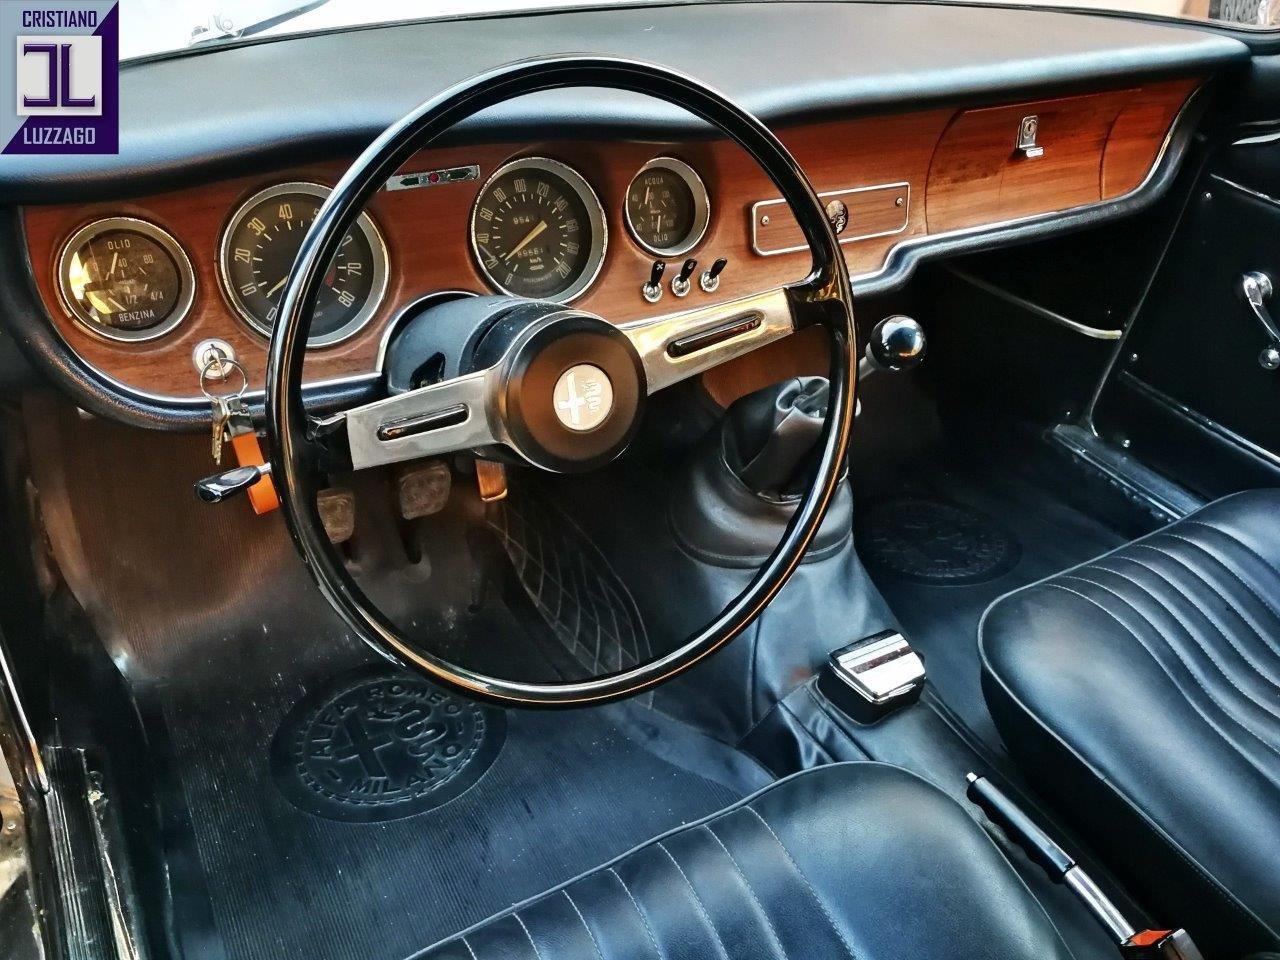 1968 ALFA ROMEO GT JUNIOR 1300 SCALINO SOLD (picture 5 of 6)